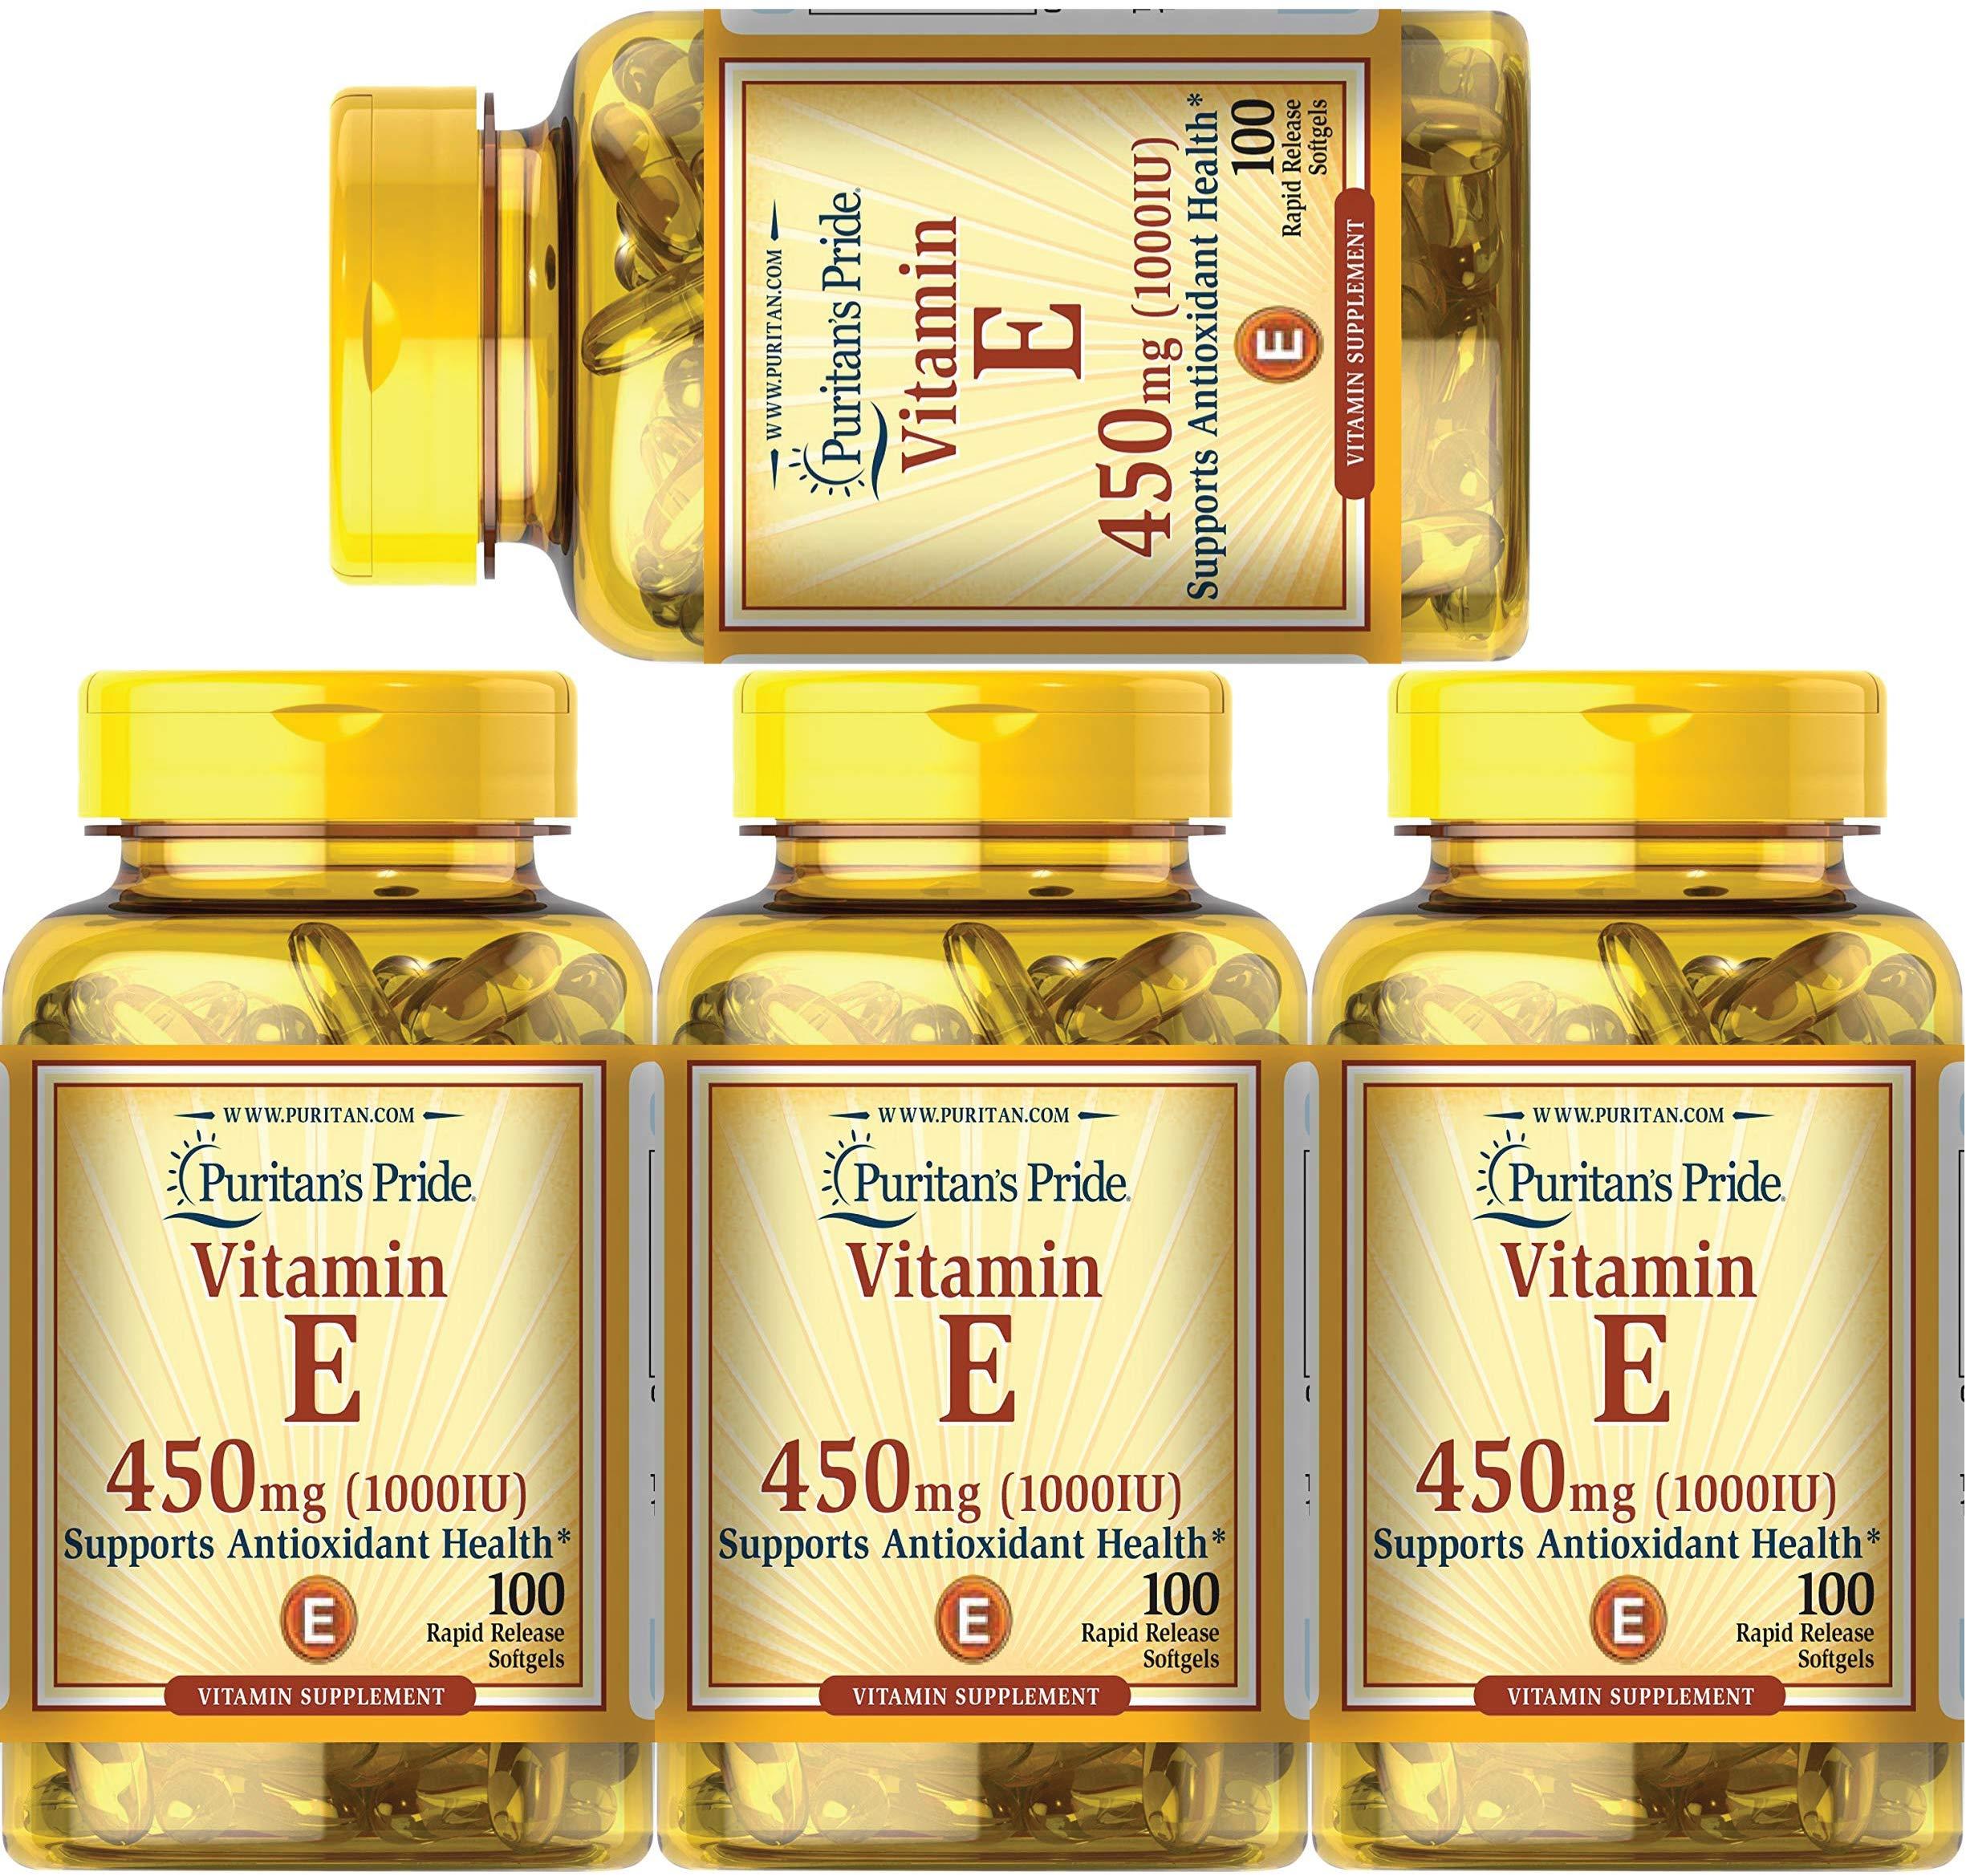 Puritan's Pride Vitamin E 1000 IU Soft Gels,100 Count (4 Pack) by Puritan's Pride